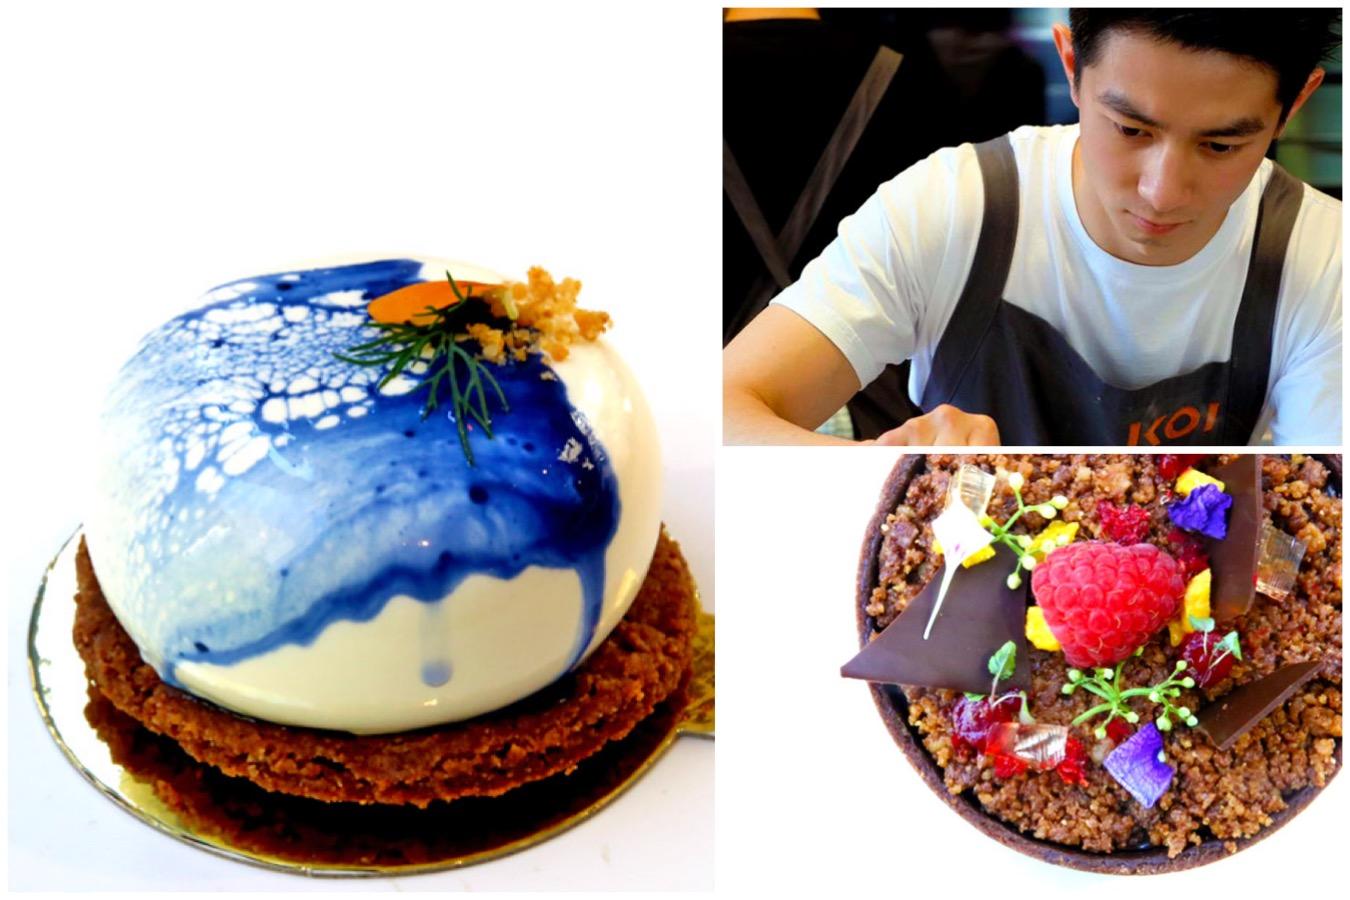 KOI Dessert Bar - MasterChef Australia's Reynold Poernomo Creates Some Dessert Magic